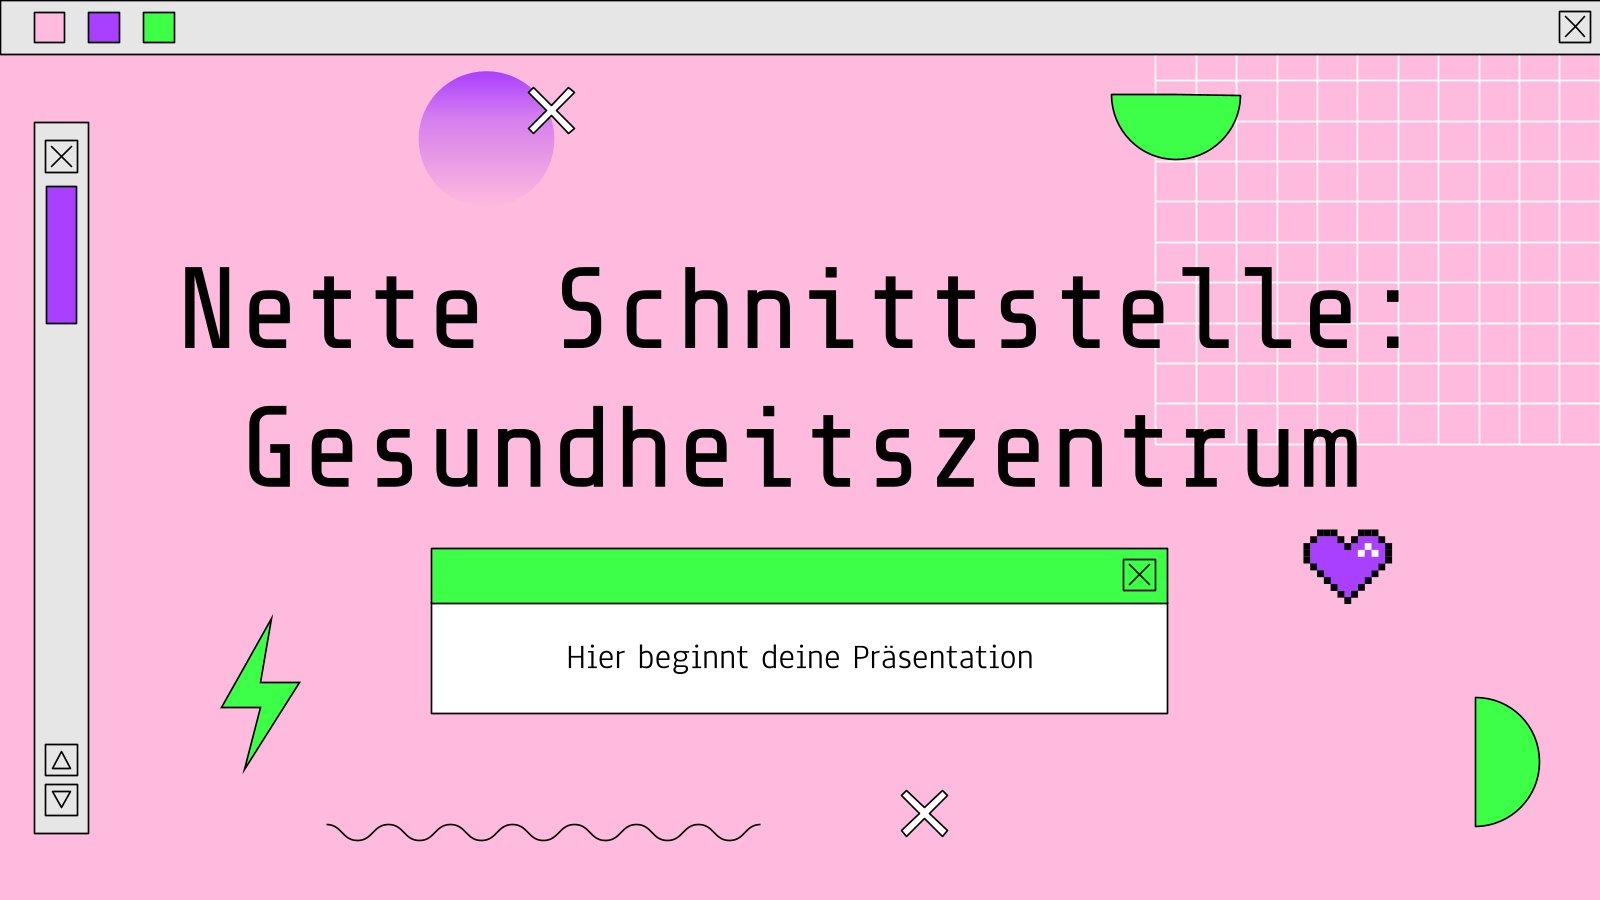 Modelo de apresentação Nette Schnittstelle - Gesundheitszentrum